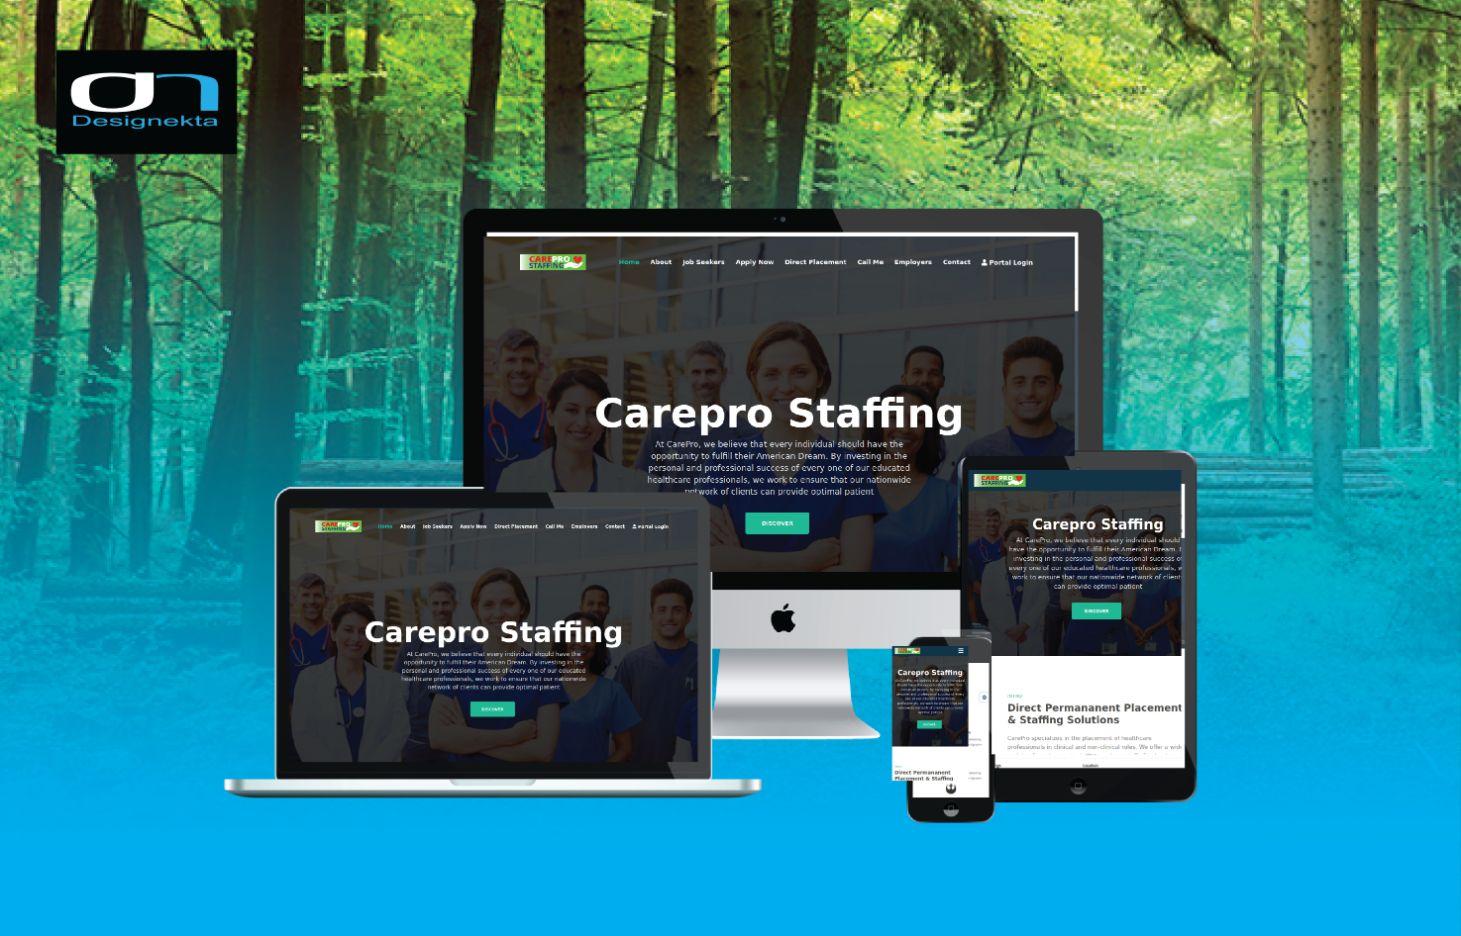 Care Pro Staffing